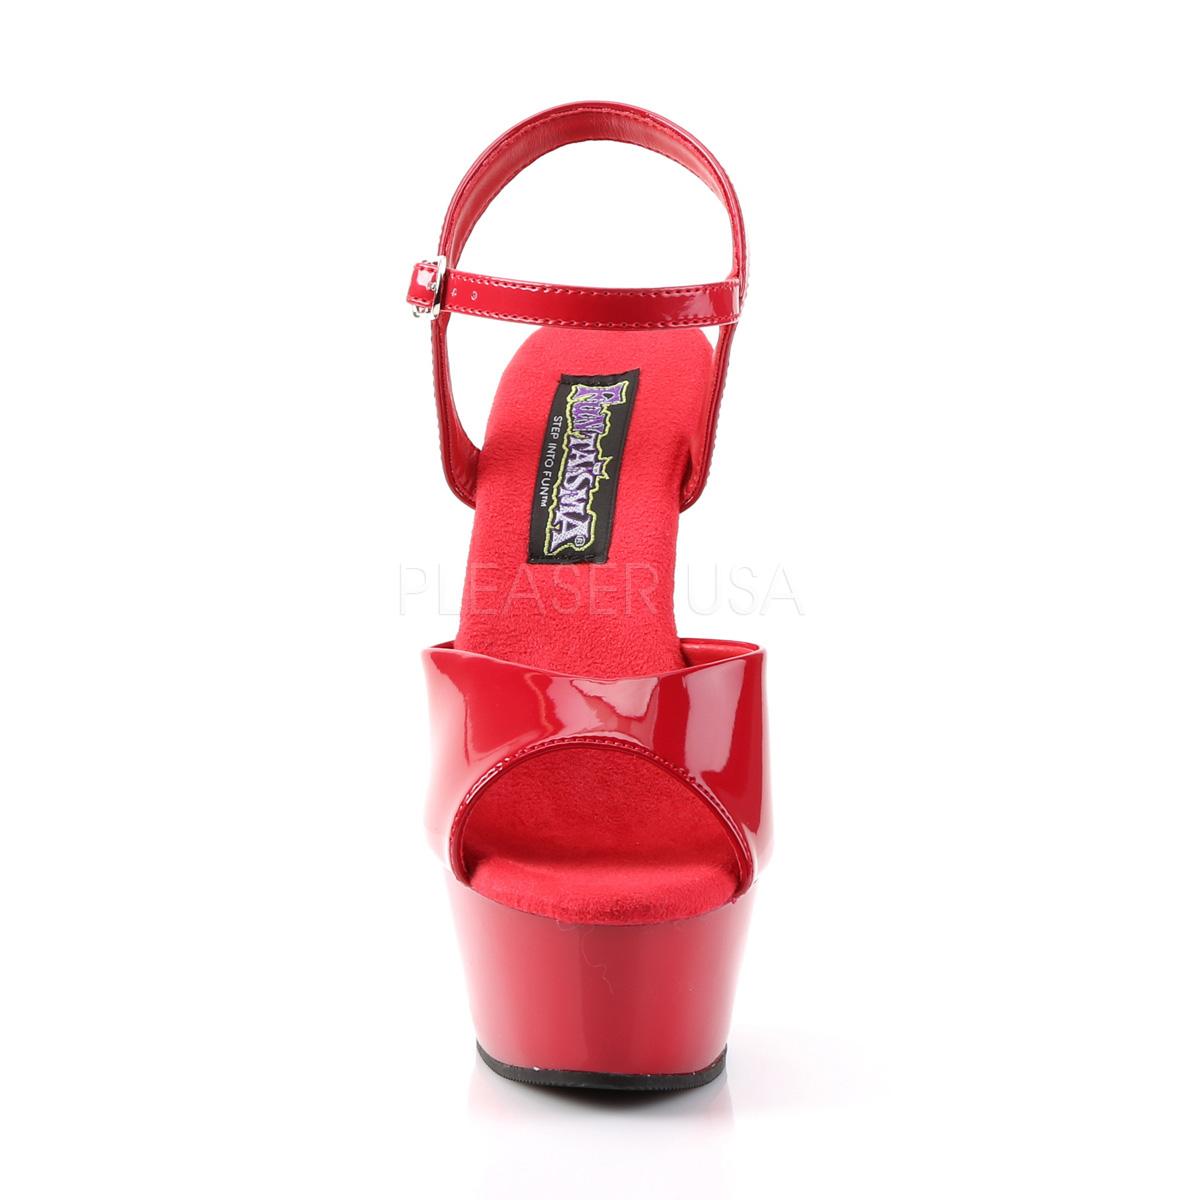 Funtasma JULIET-209 6inch Spike Heel, 1 3/4inch Platform Ankle Strap Sandal◆取り寄せ